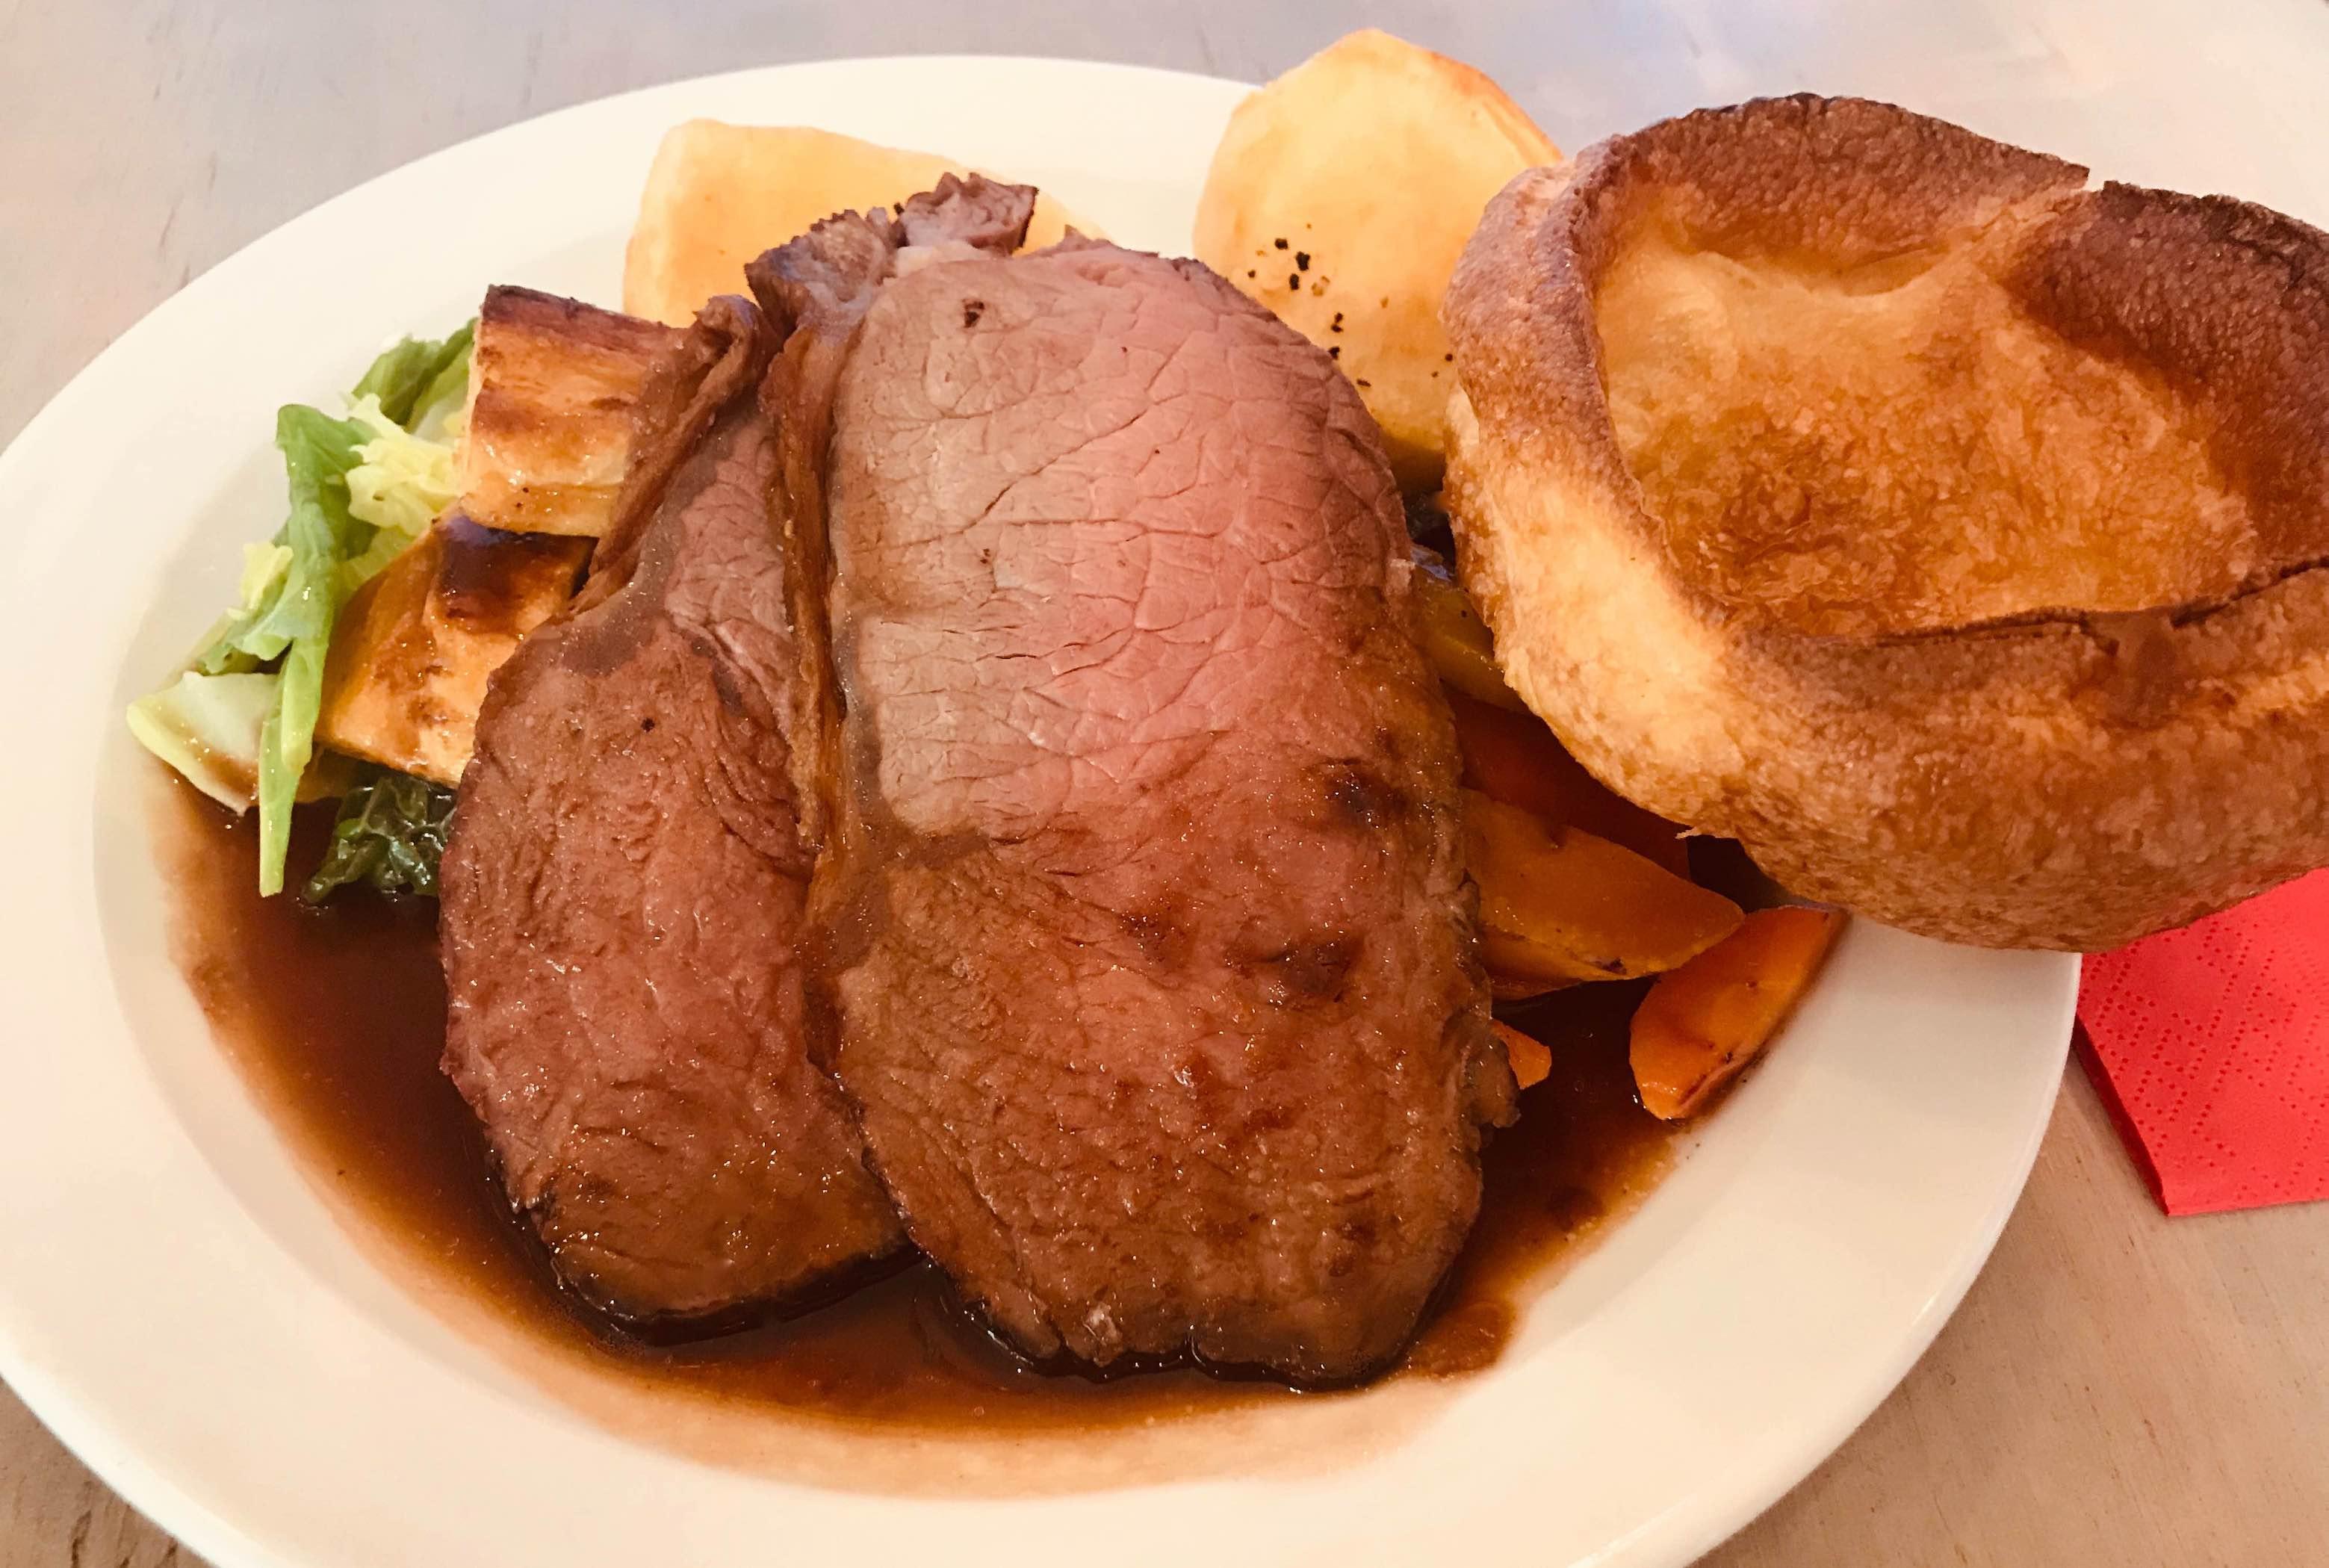 Sunday Roast beef Richard's Kitchen Tooting Bec.